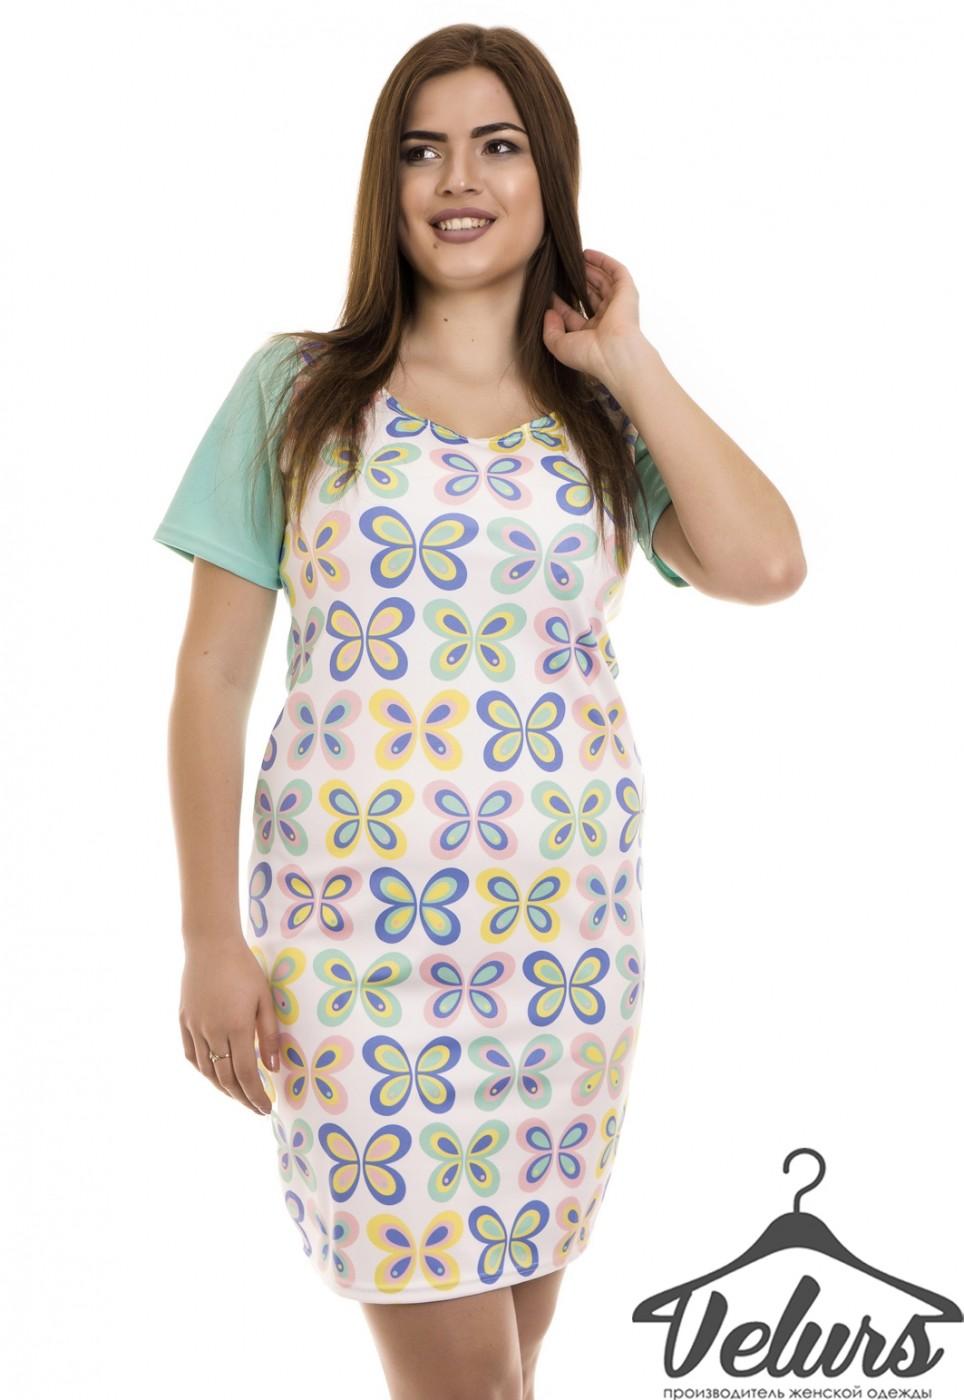 Velurs: Платье 212108 - фото 2